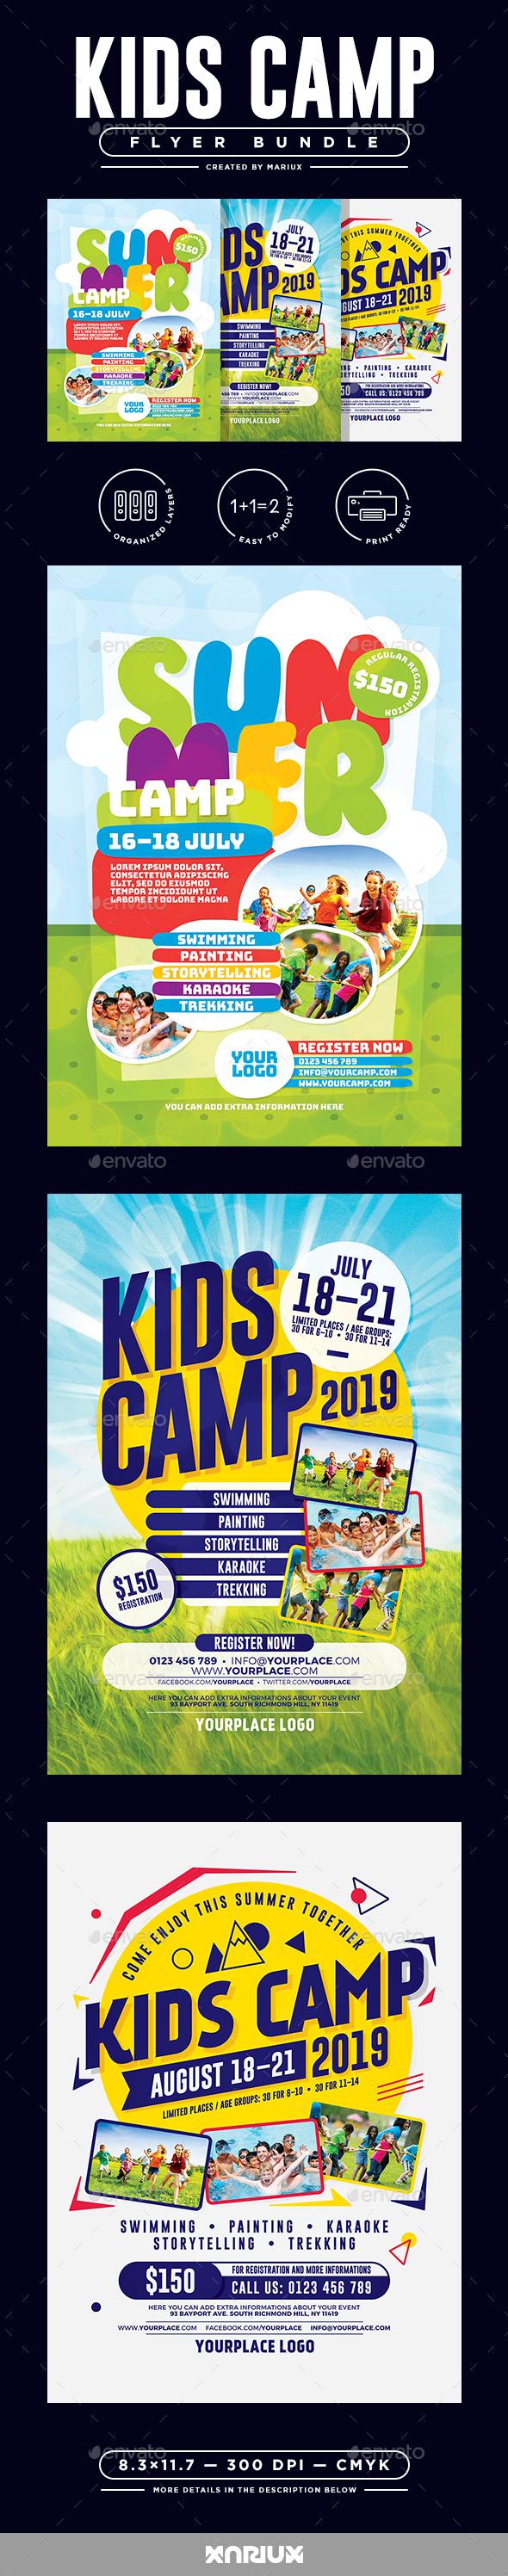 Kids Camp Flyer/Poster Bundle - Corporate Flyers